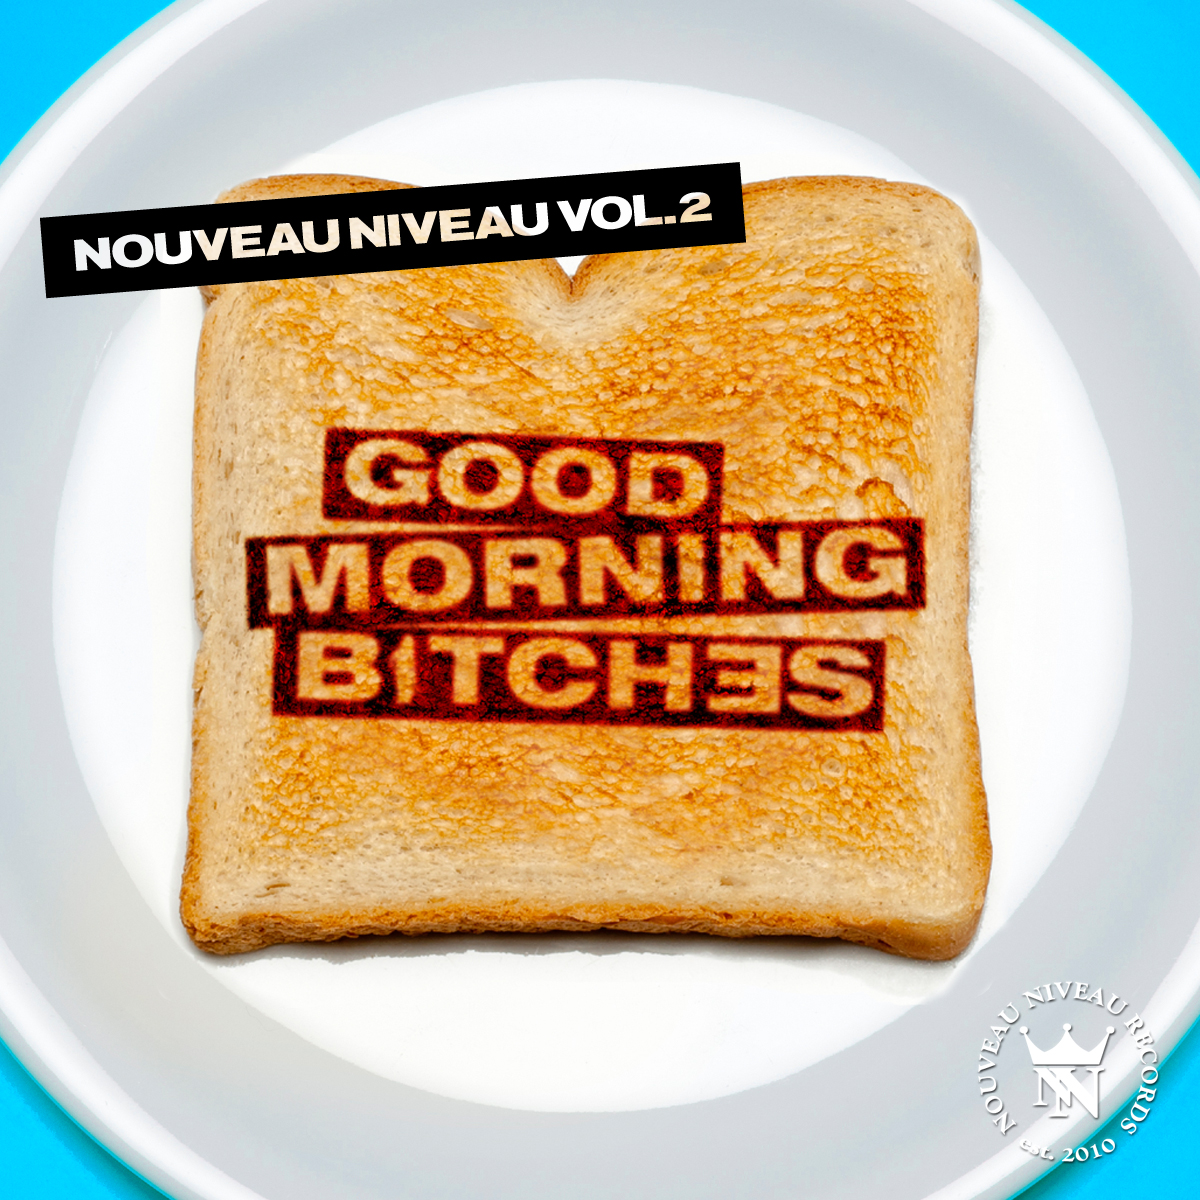 "Tom Novy präsentiert Nouveau Niveaus zweite Compilation ""Good Morning Bitches"""